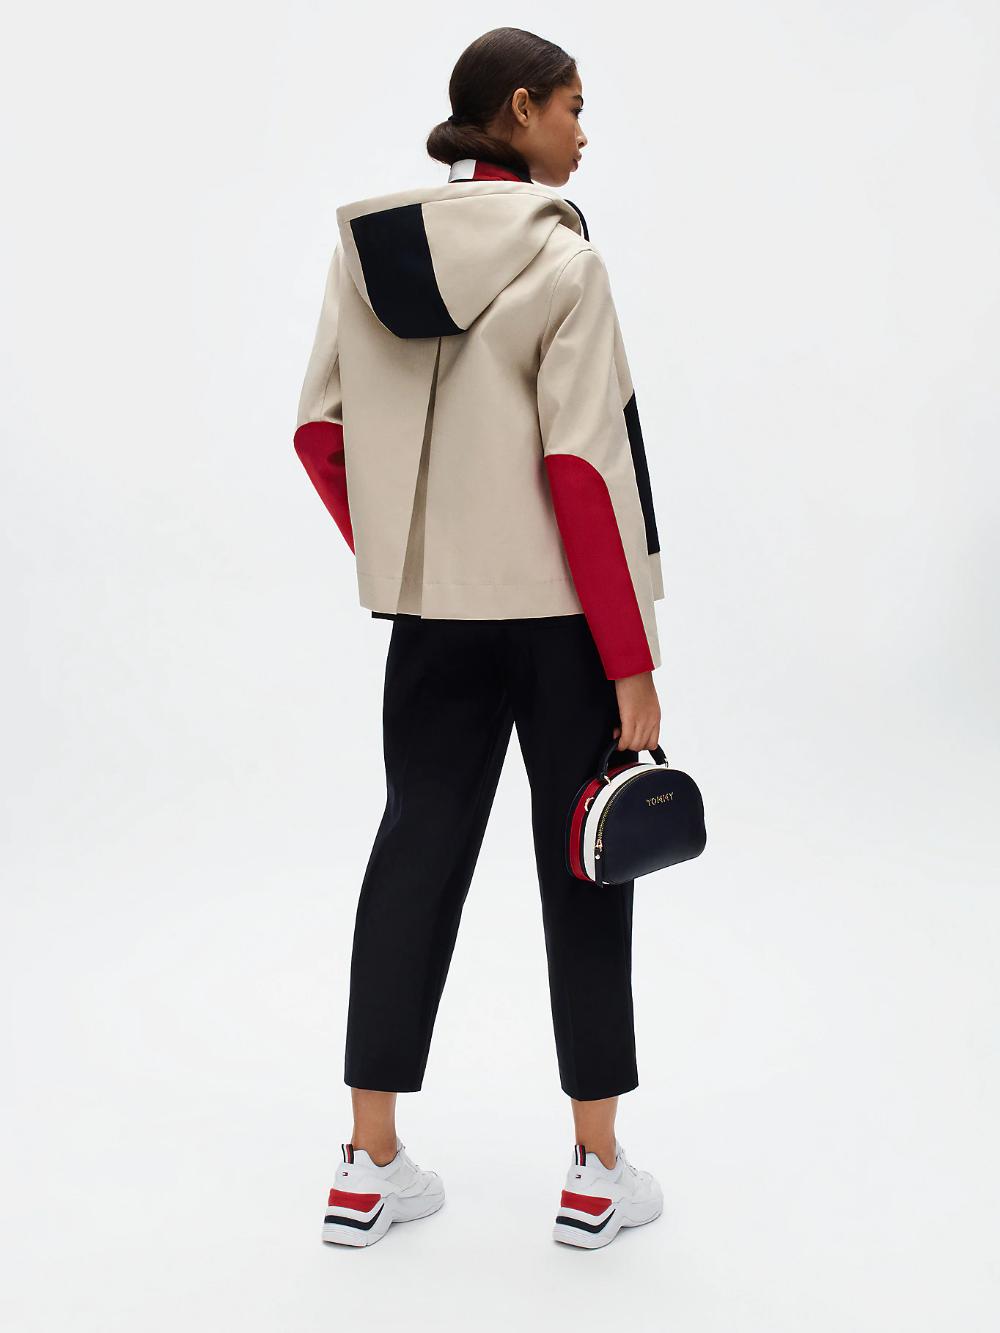 Tommy Icons Bonded Cotton Jacket Grey Tommy Hilfiger Tommy Hilfiger Women S Coats Jackets Cotton Jacket [ 1333 x 1000 Pixel ]